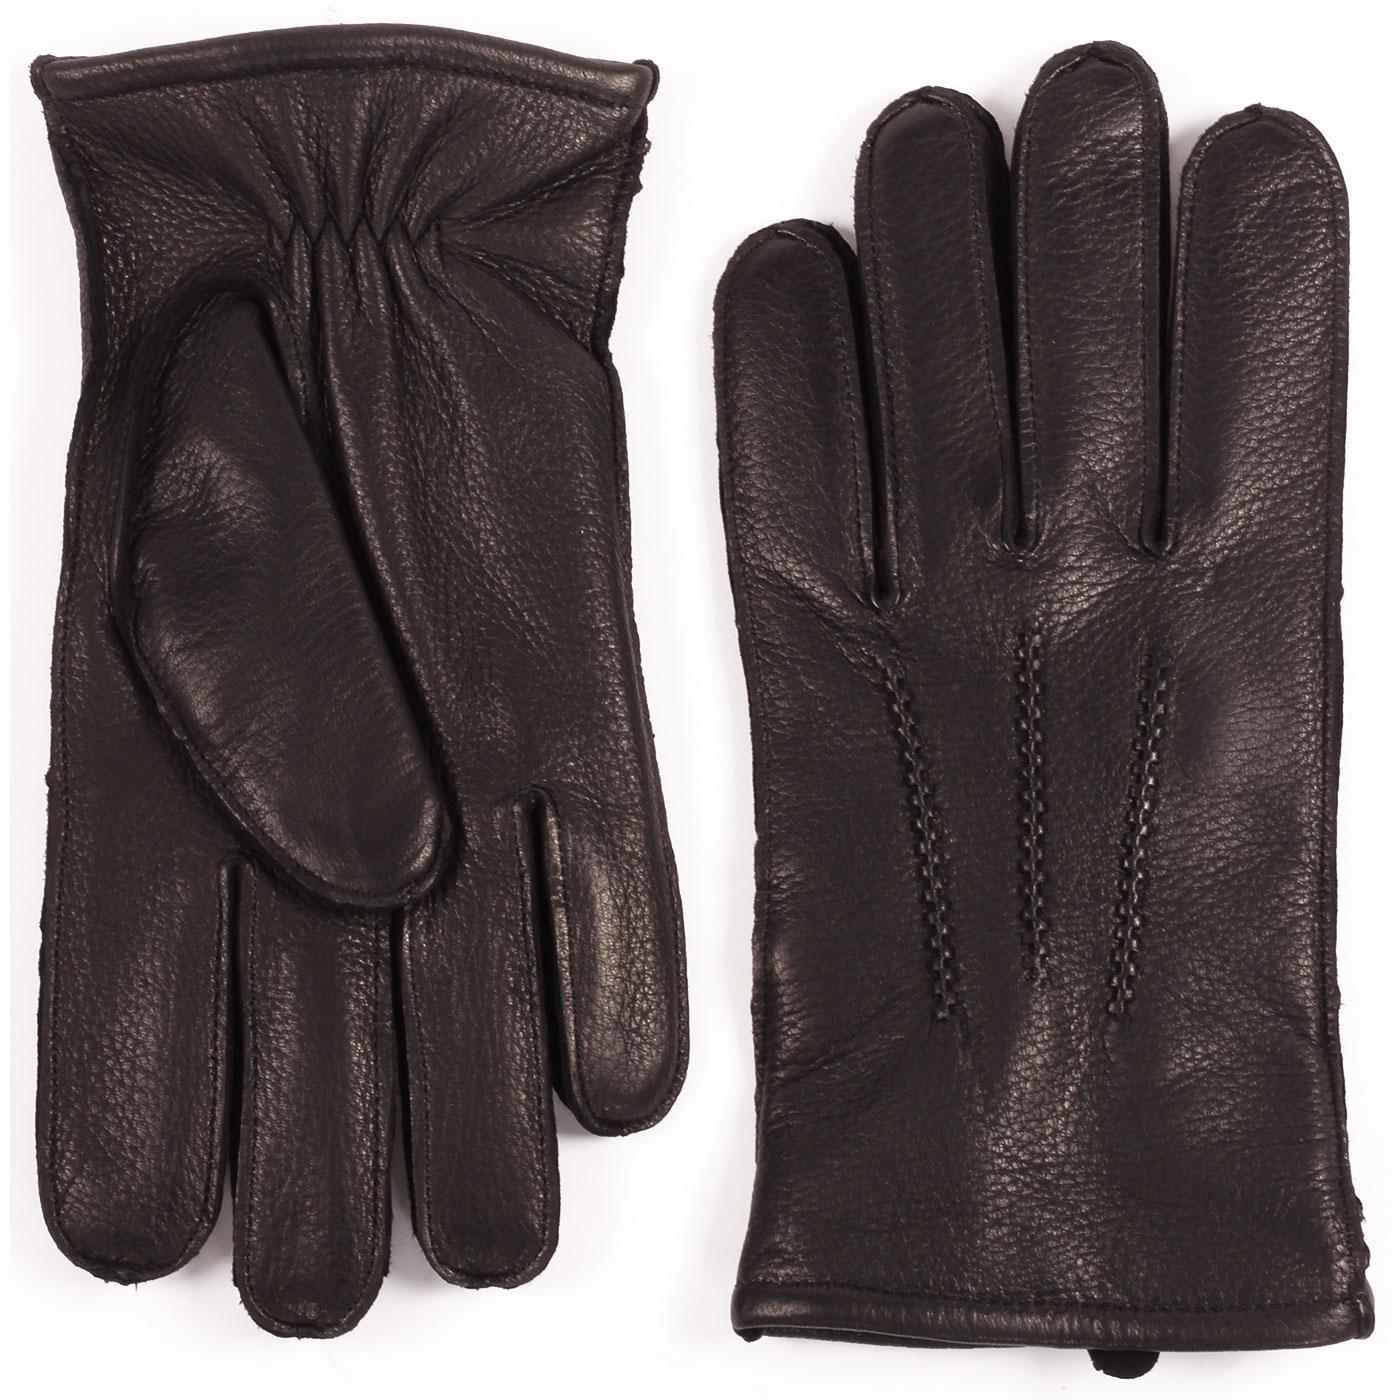 Winston FAILSWORTH Men's Retro Leather Gloves (B)